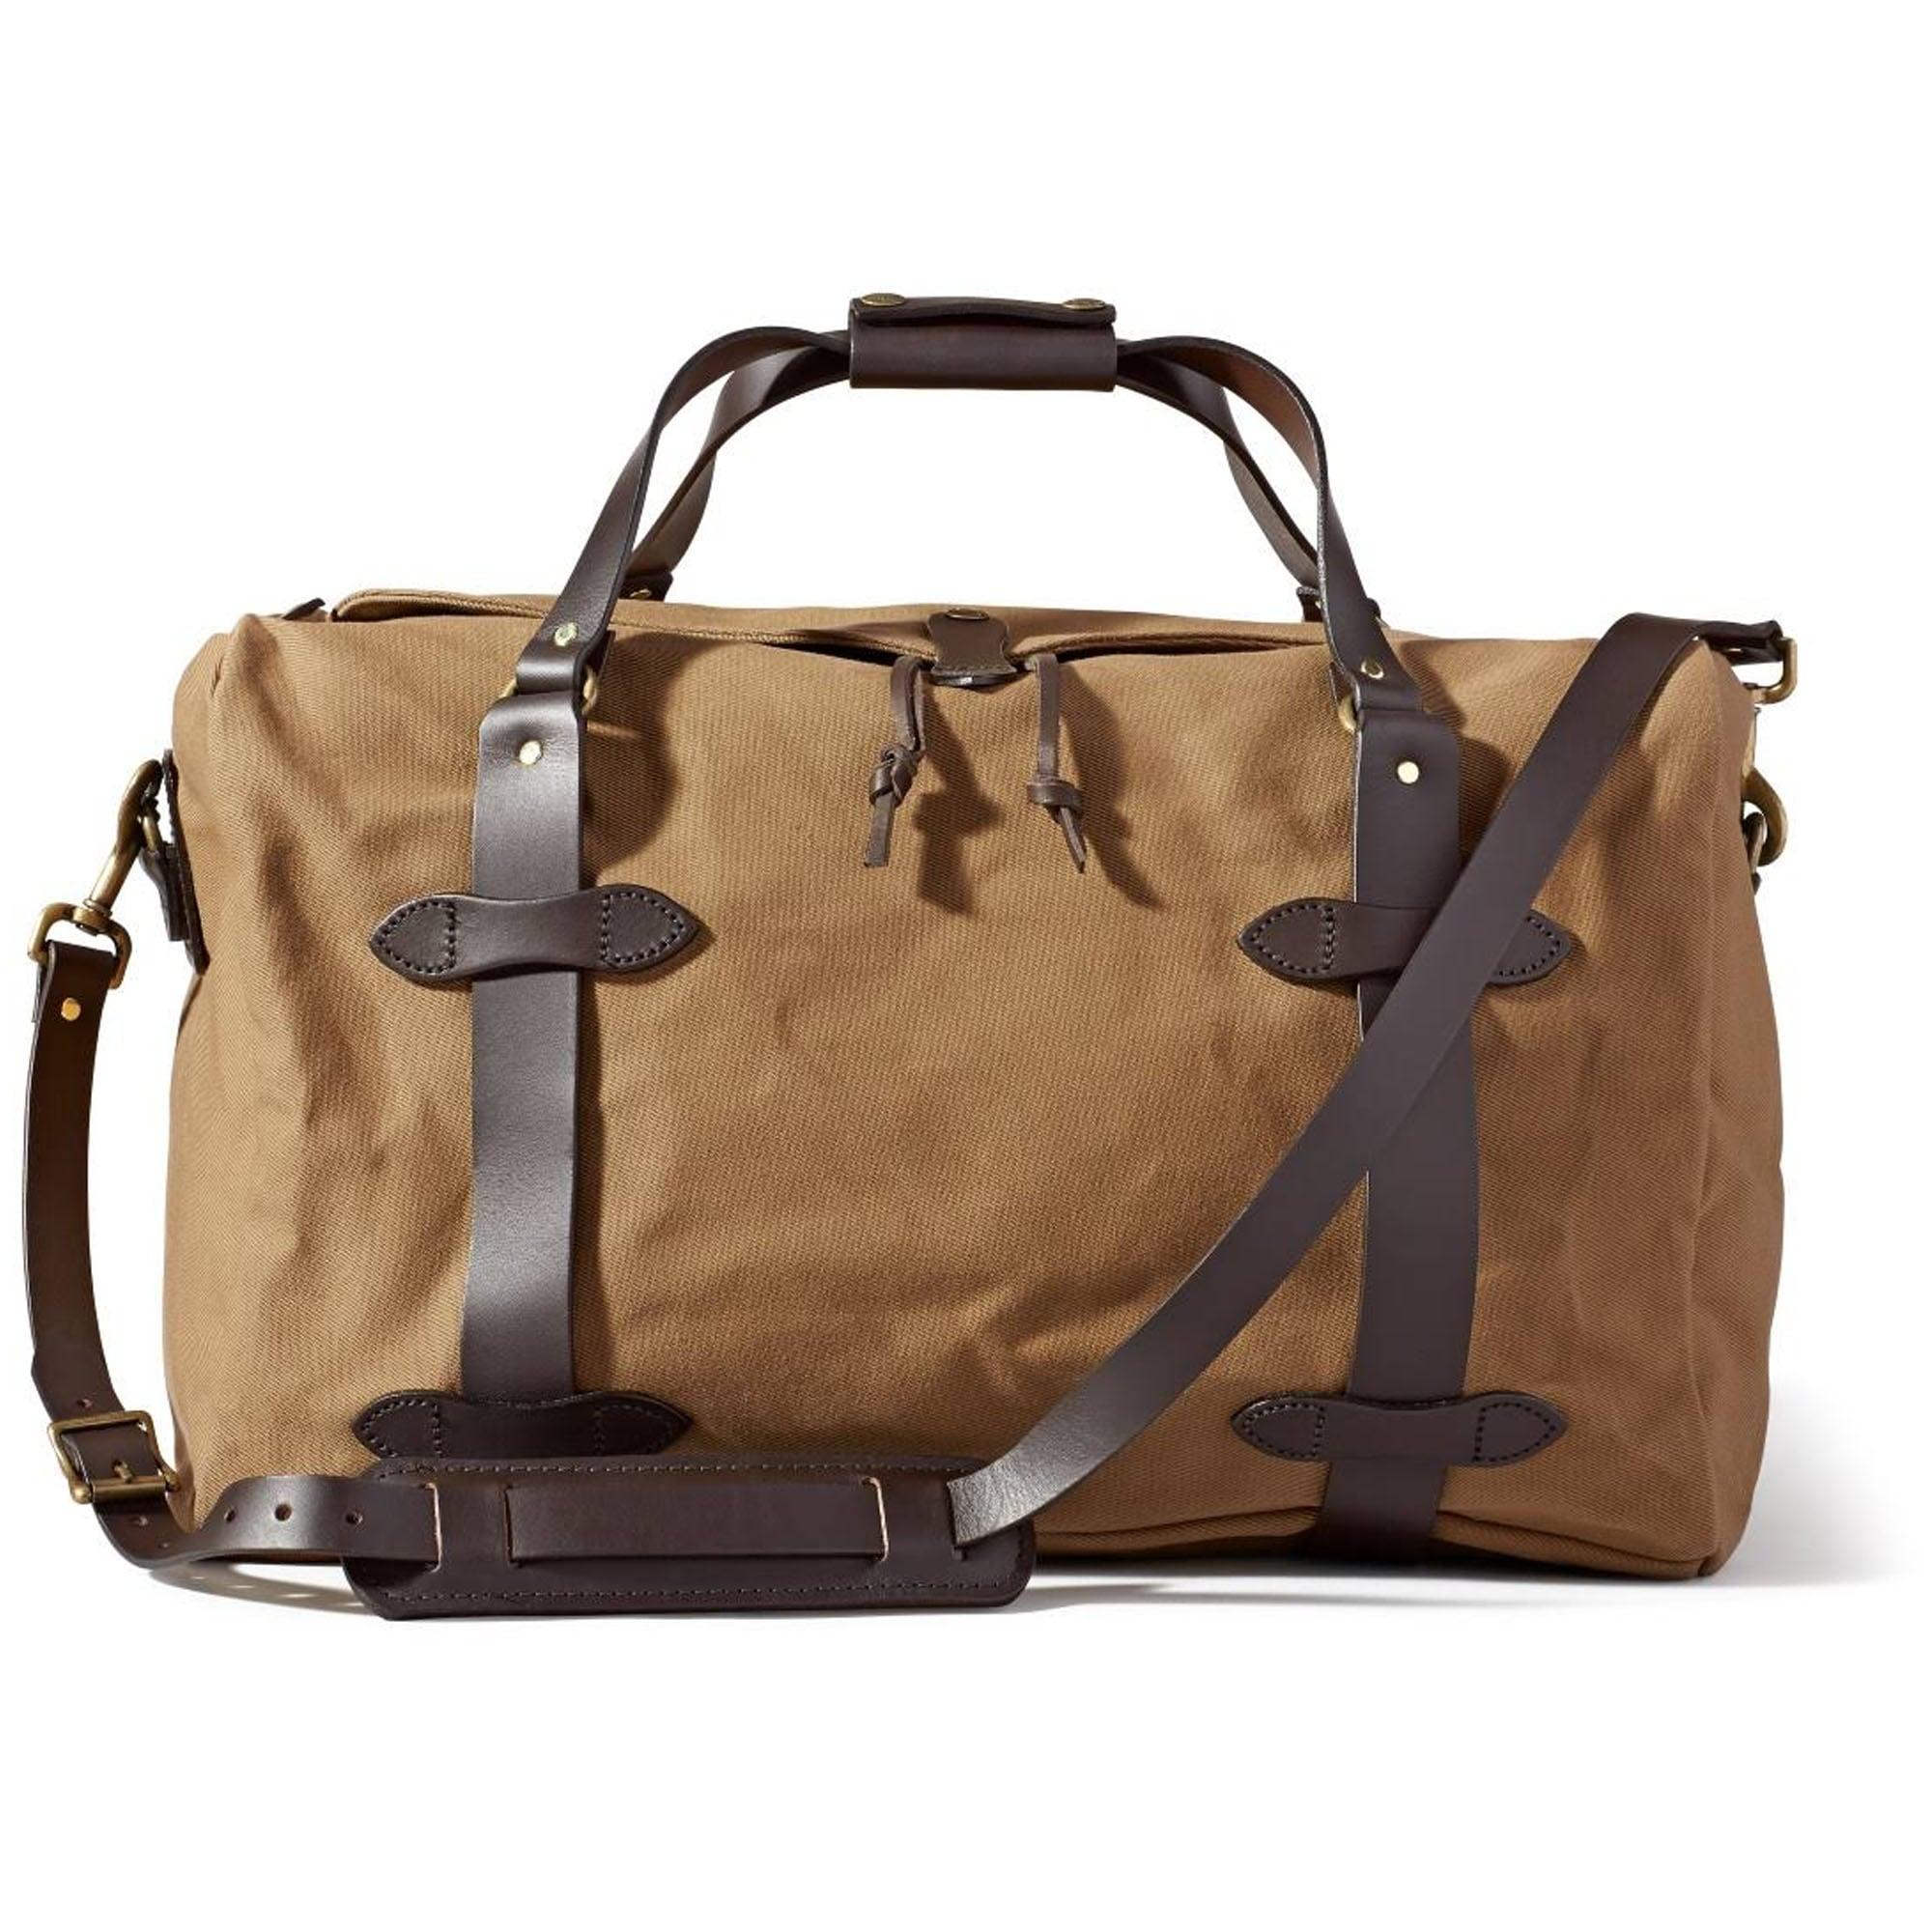 Filson Medium Travel Bag Tan 70246242135